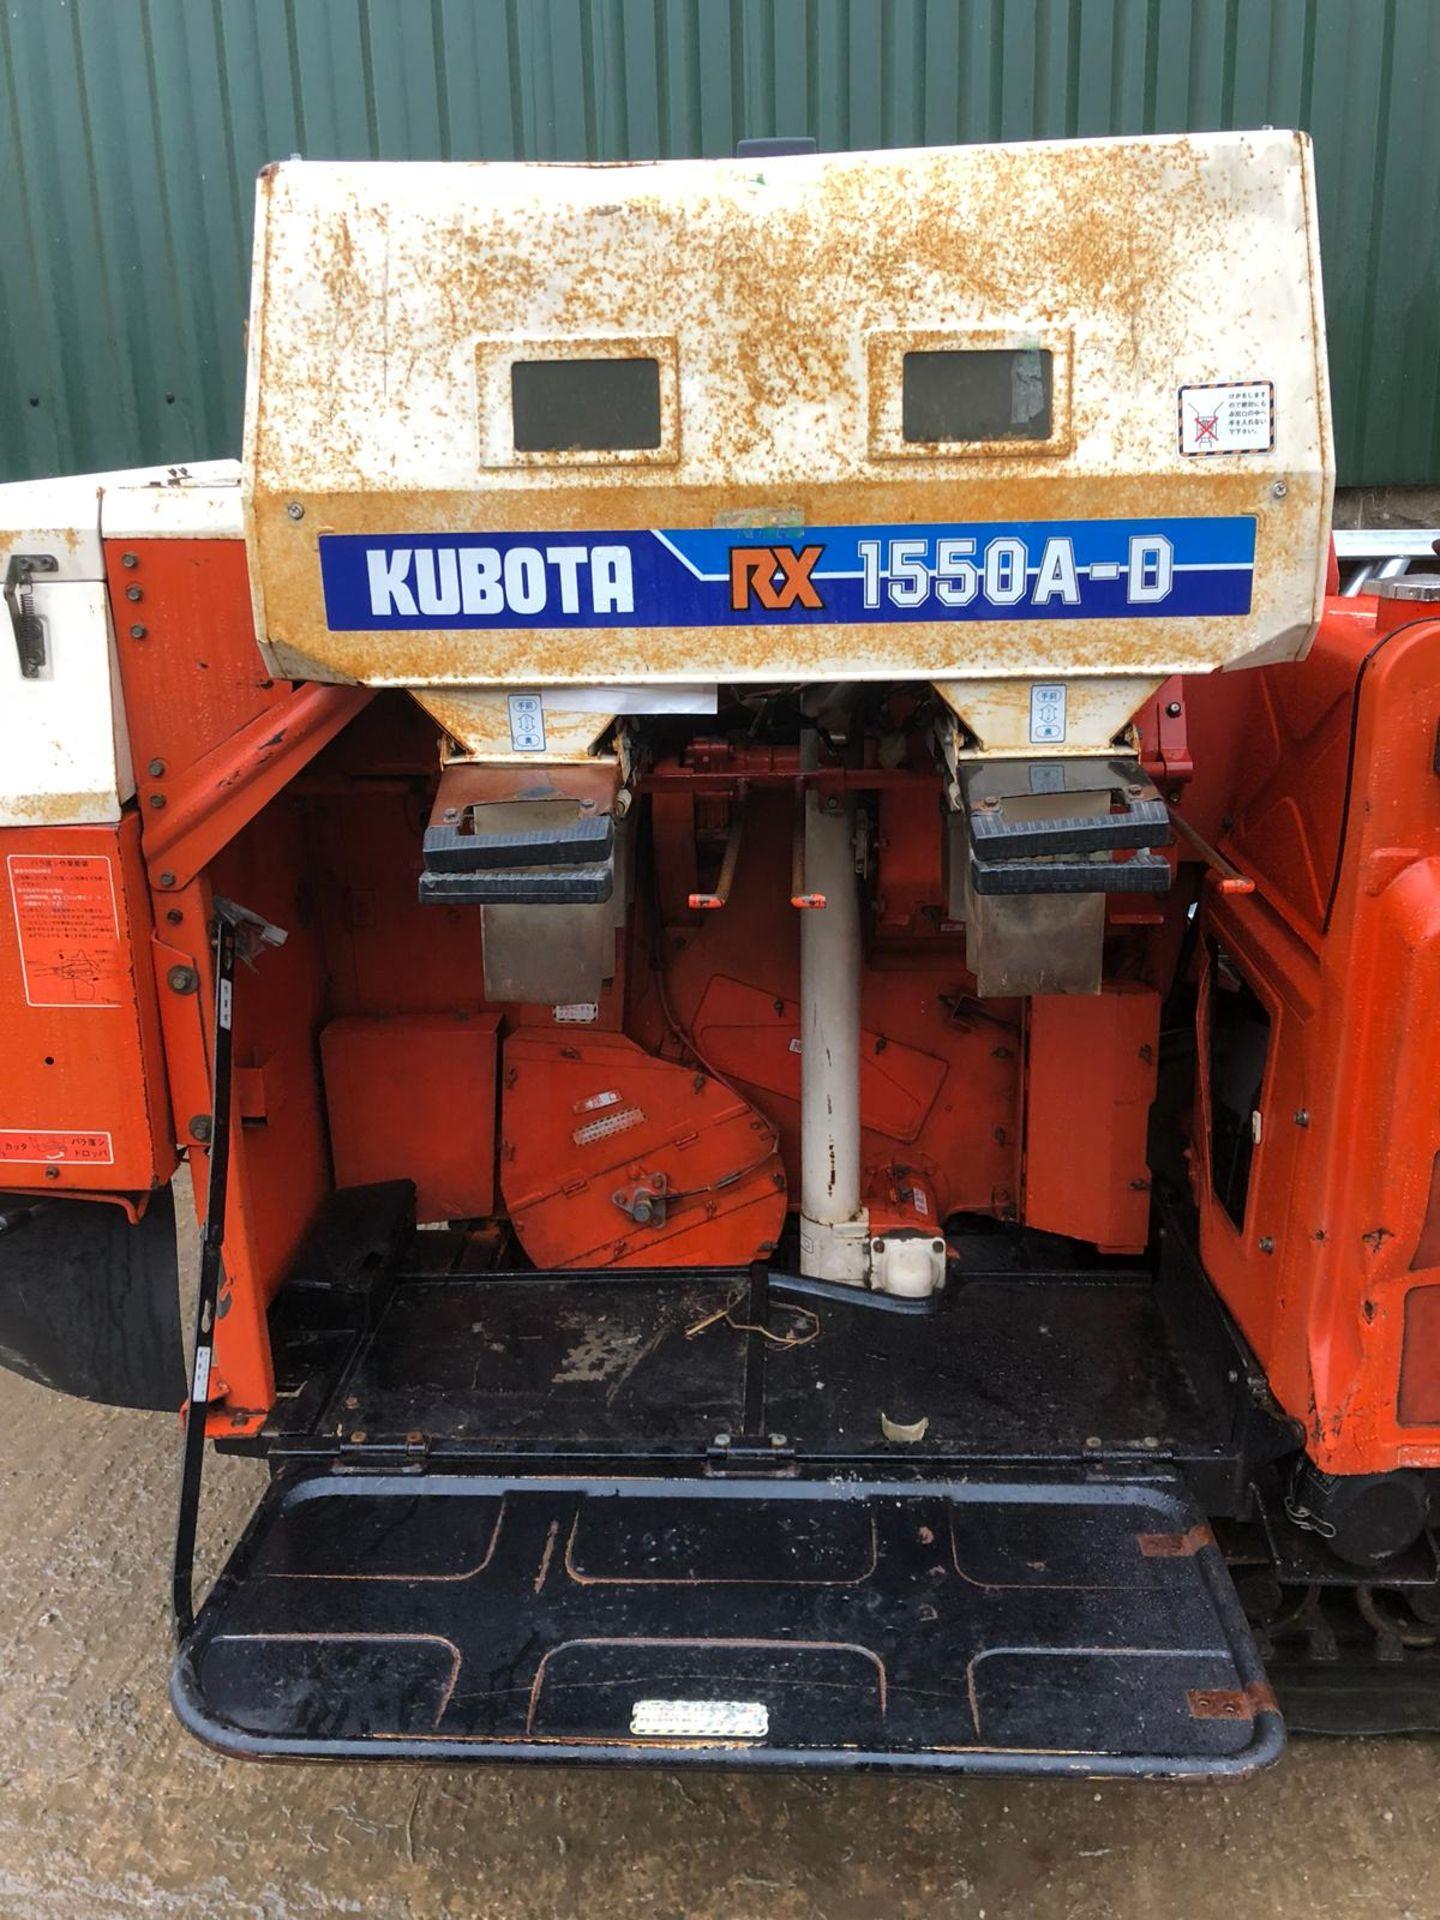 Lot 506 - KUBOTA RX 1550A-D RICE HARVESTER DIESEL RUBBER TRACKS LEVER DRIVE *PLUS VAT*